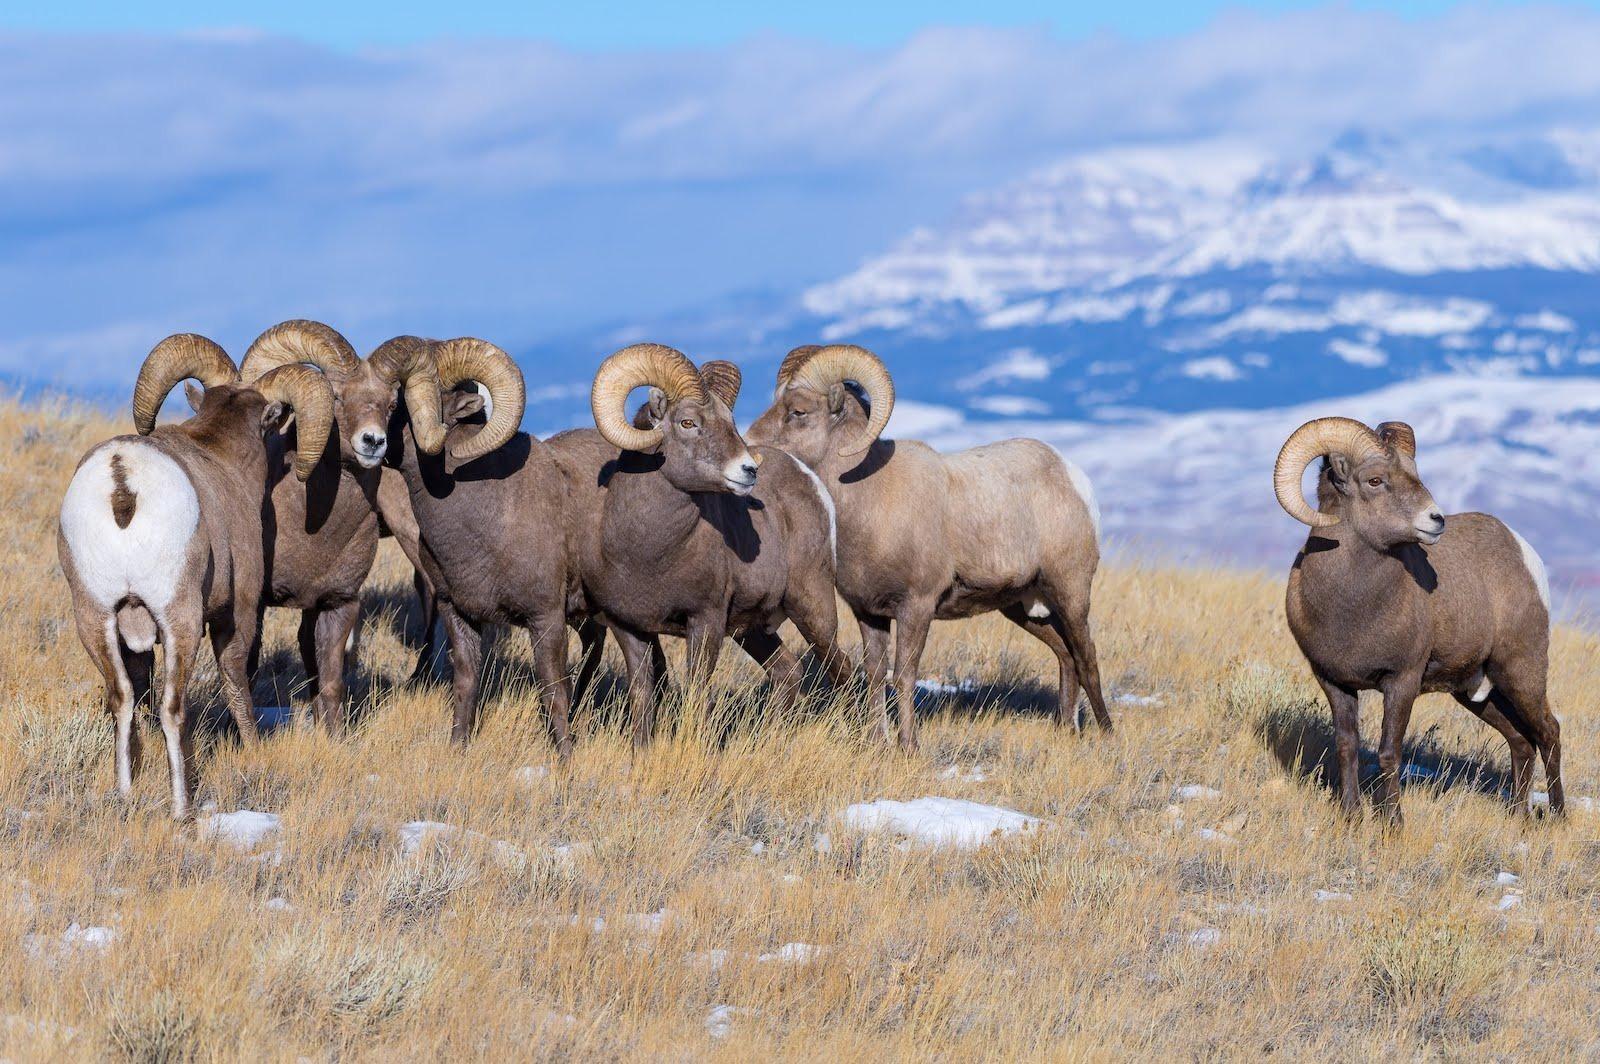 Bighorn Sheep near Dubois, Wyoming and Yellowstone in winter